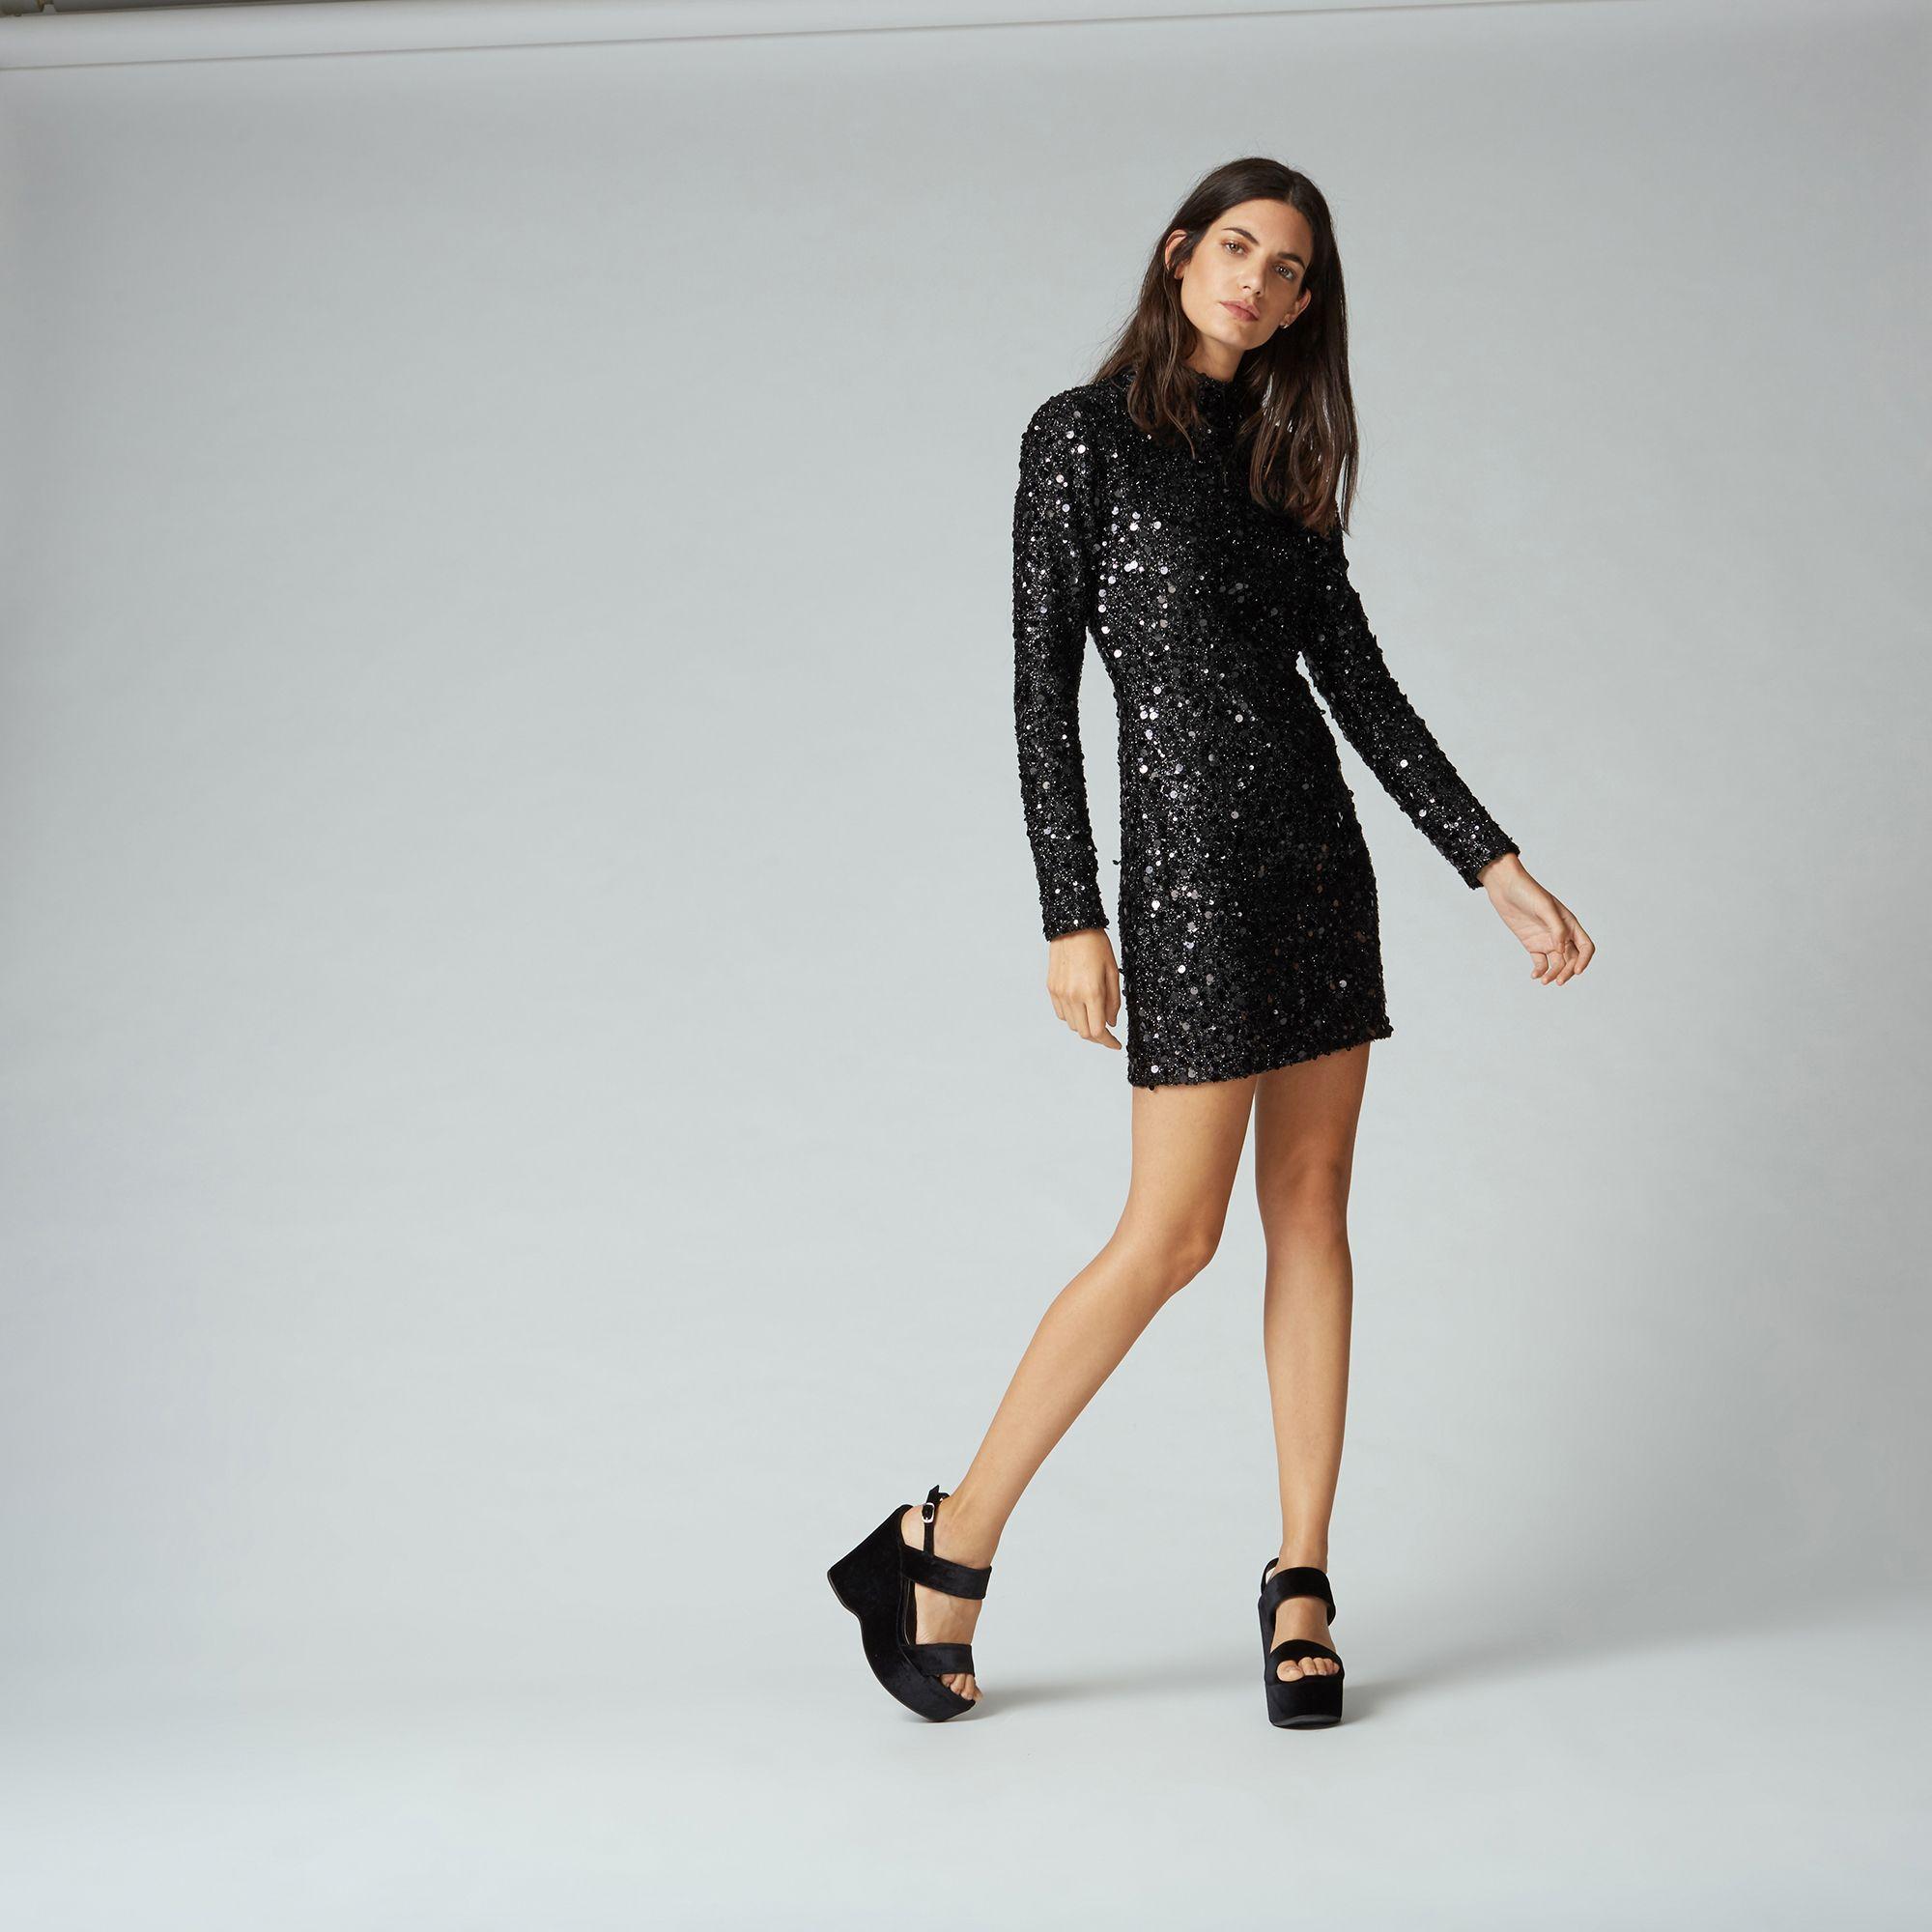 Warehouse black dress sequins amazing